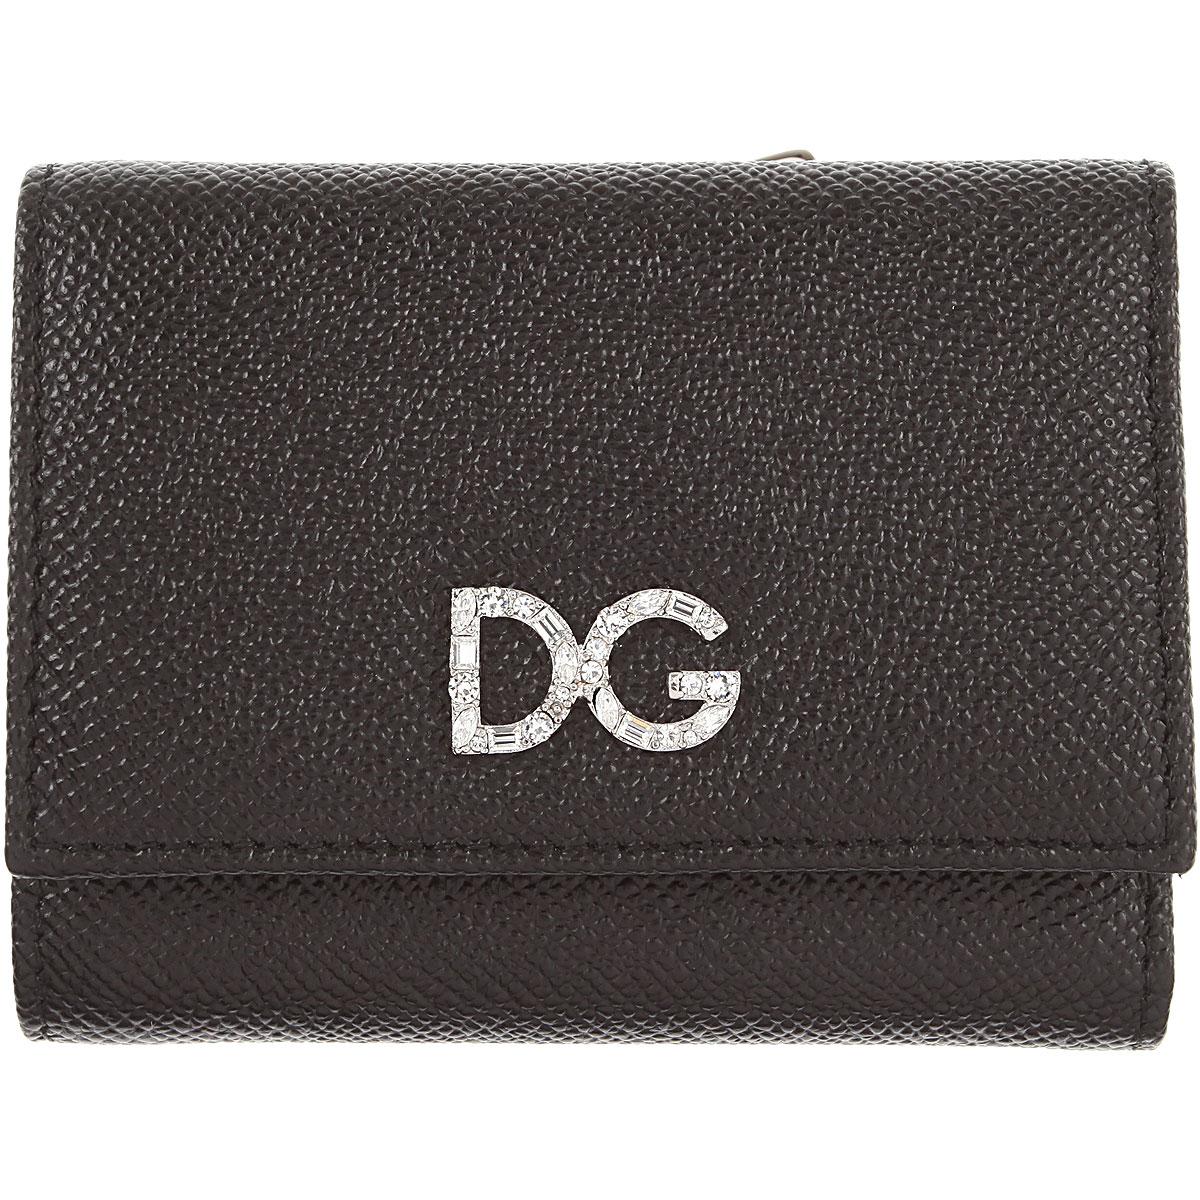 Dolce & Gabbana Womens Wallets, Black, Leather, 2017